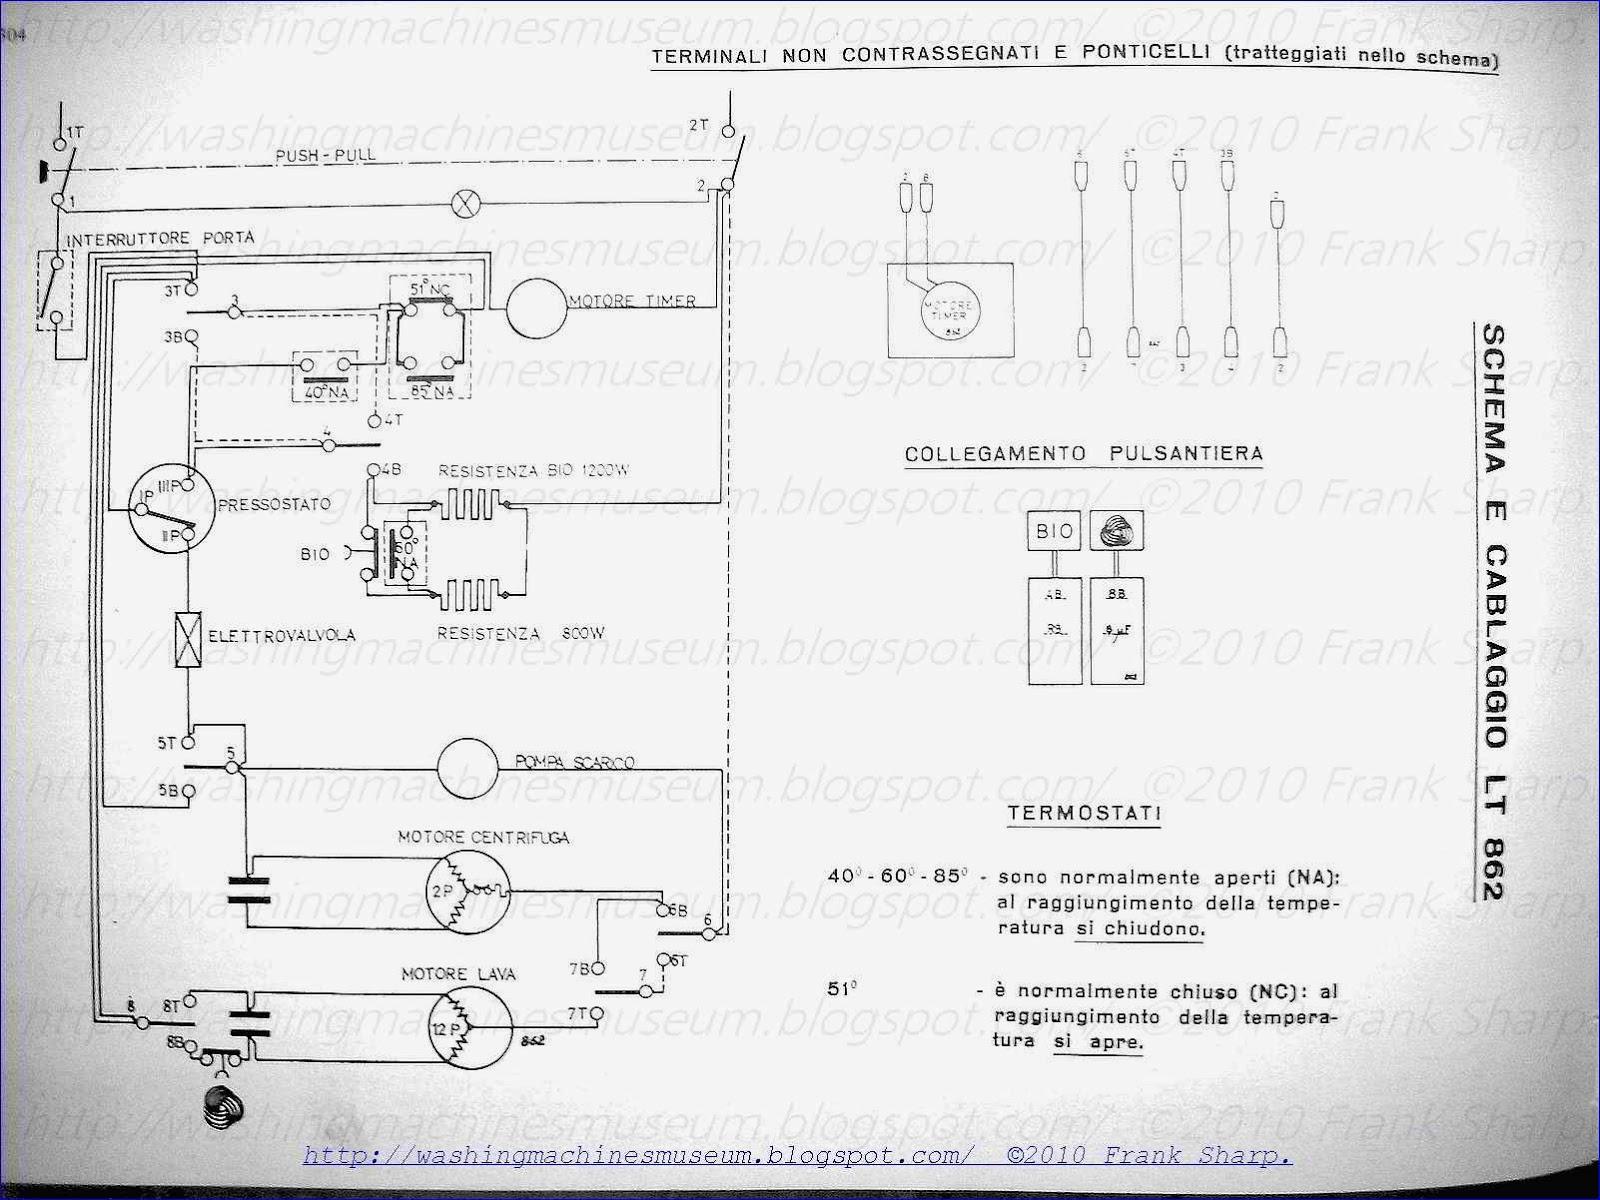 Washer Rama Museum: ZEROWATT MOD LT862 SCHEMATIC DIAGRAM